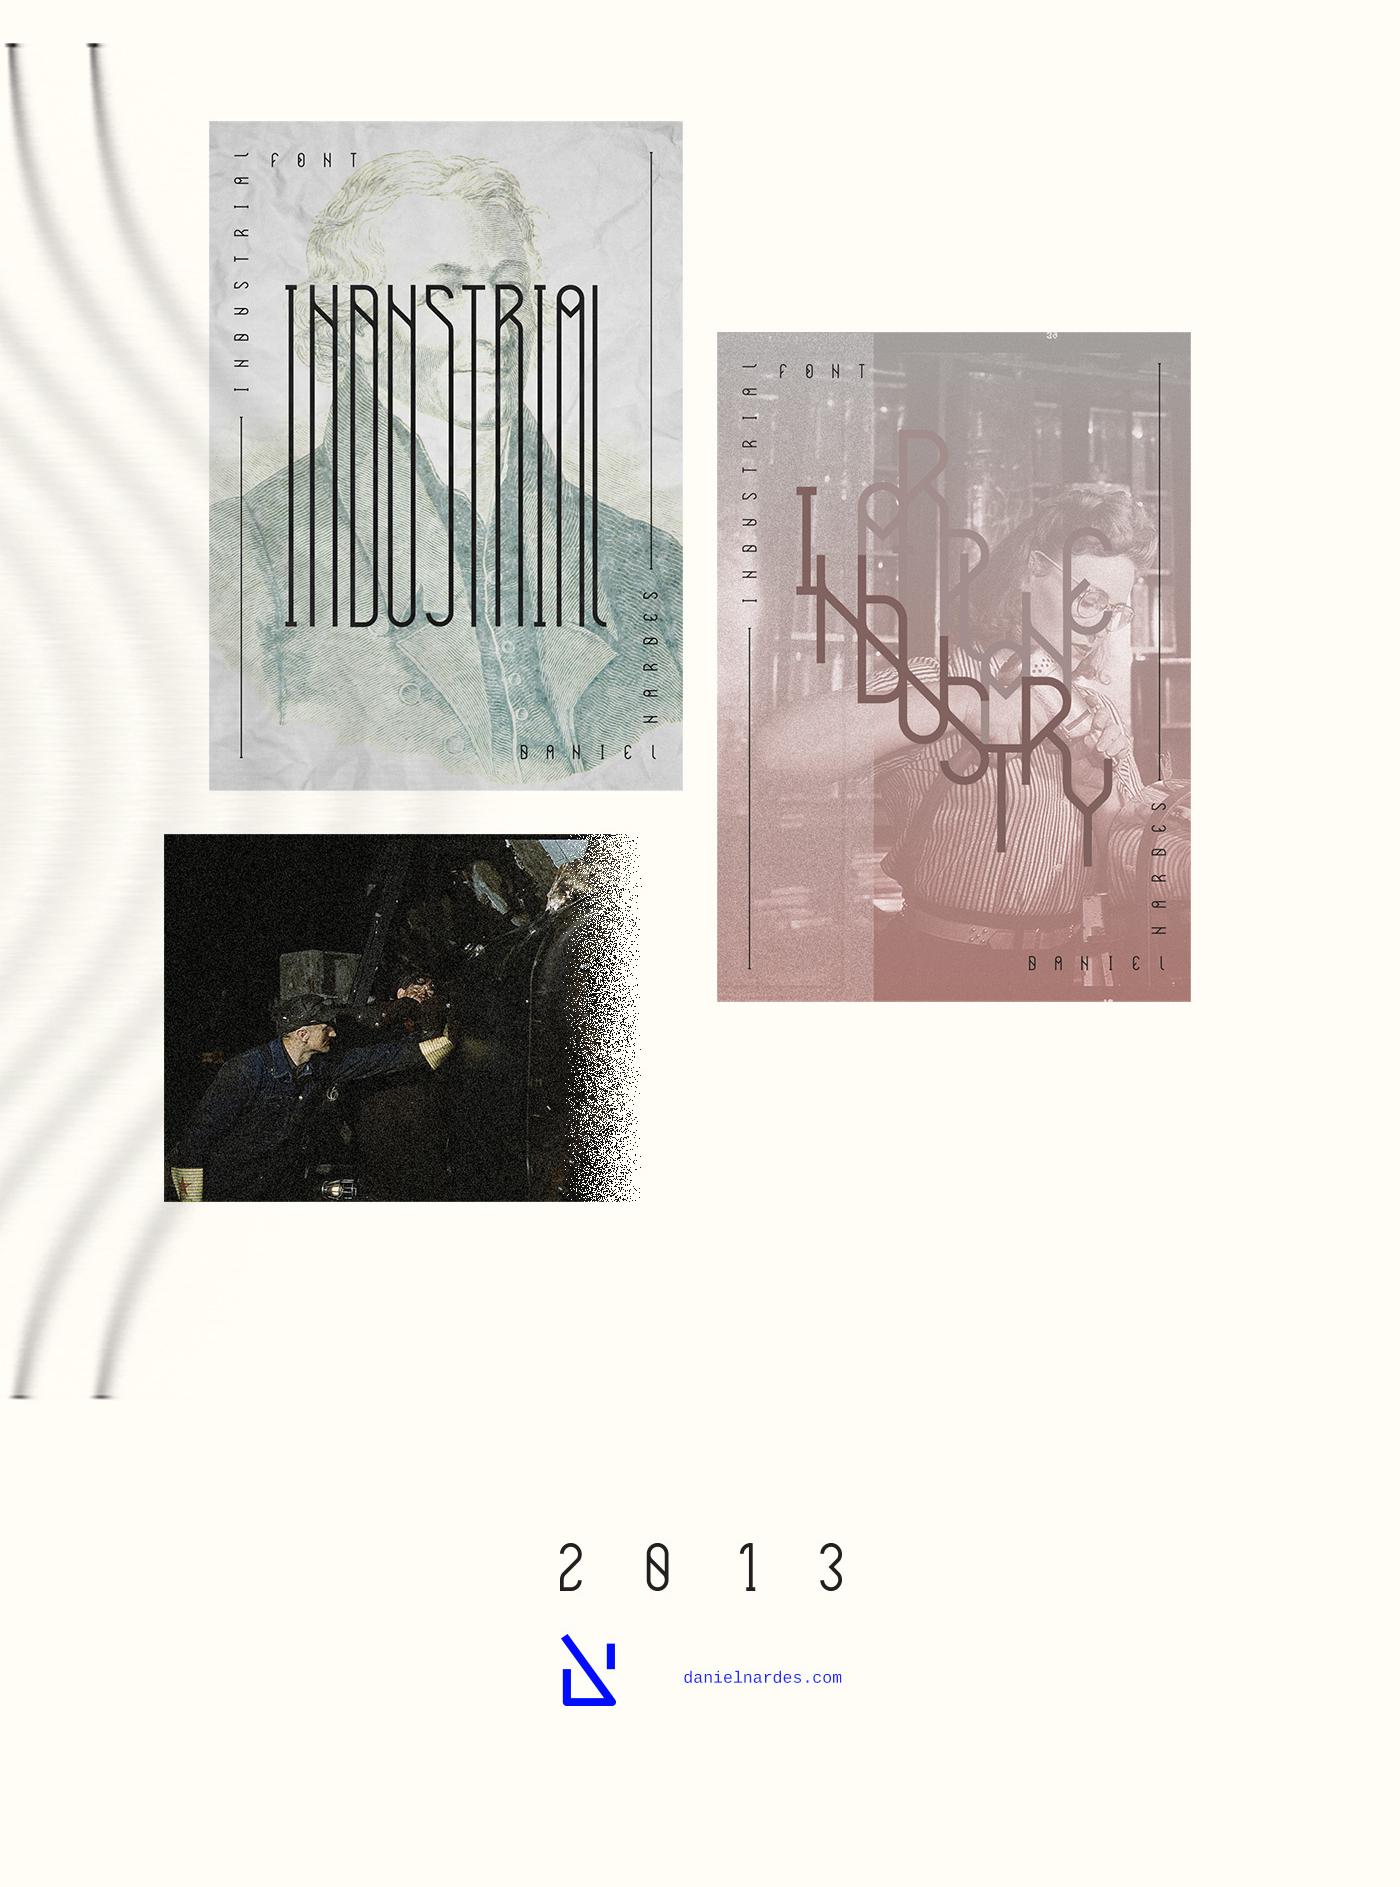 Industrial-font-Daniel_Nardes (7)